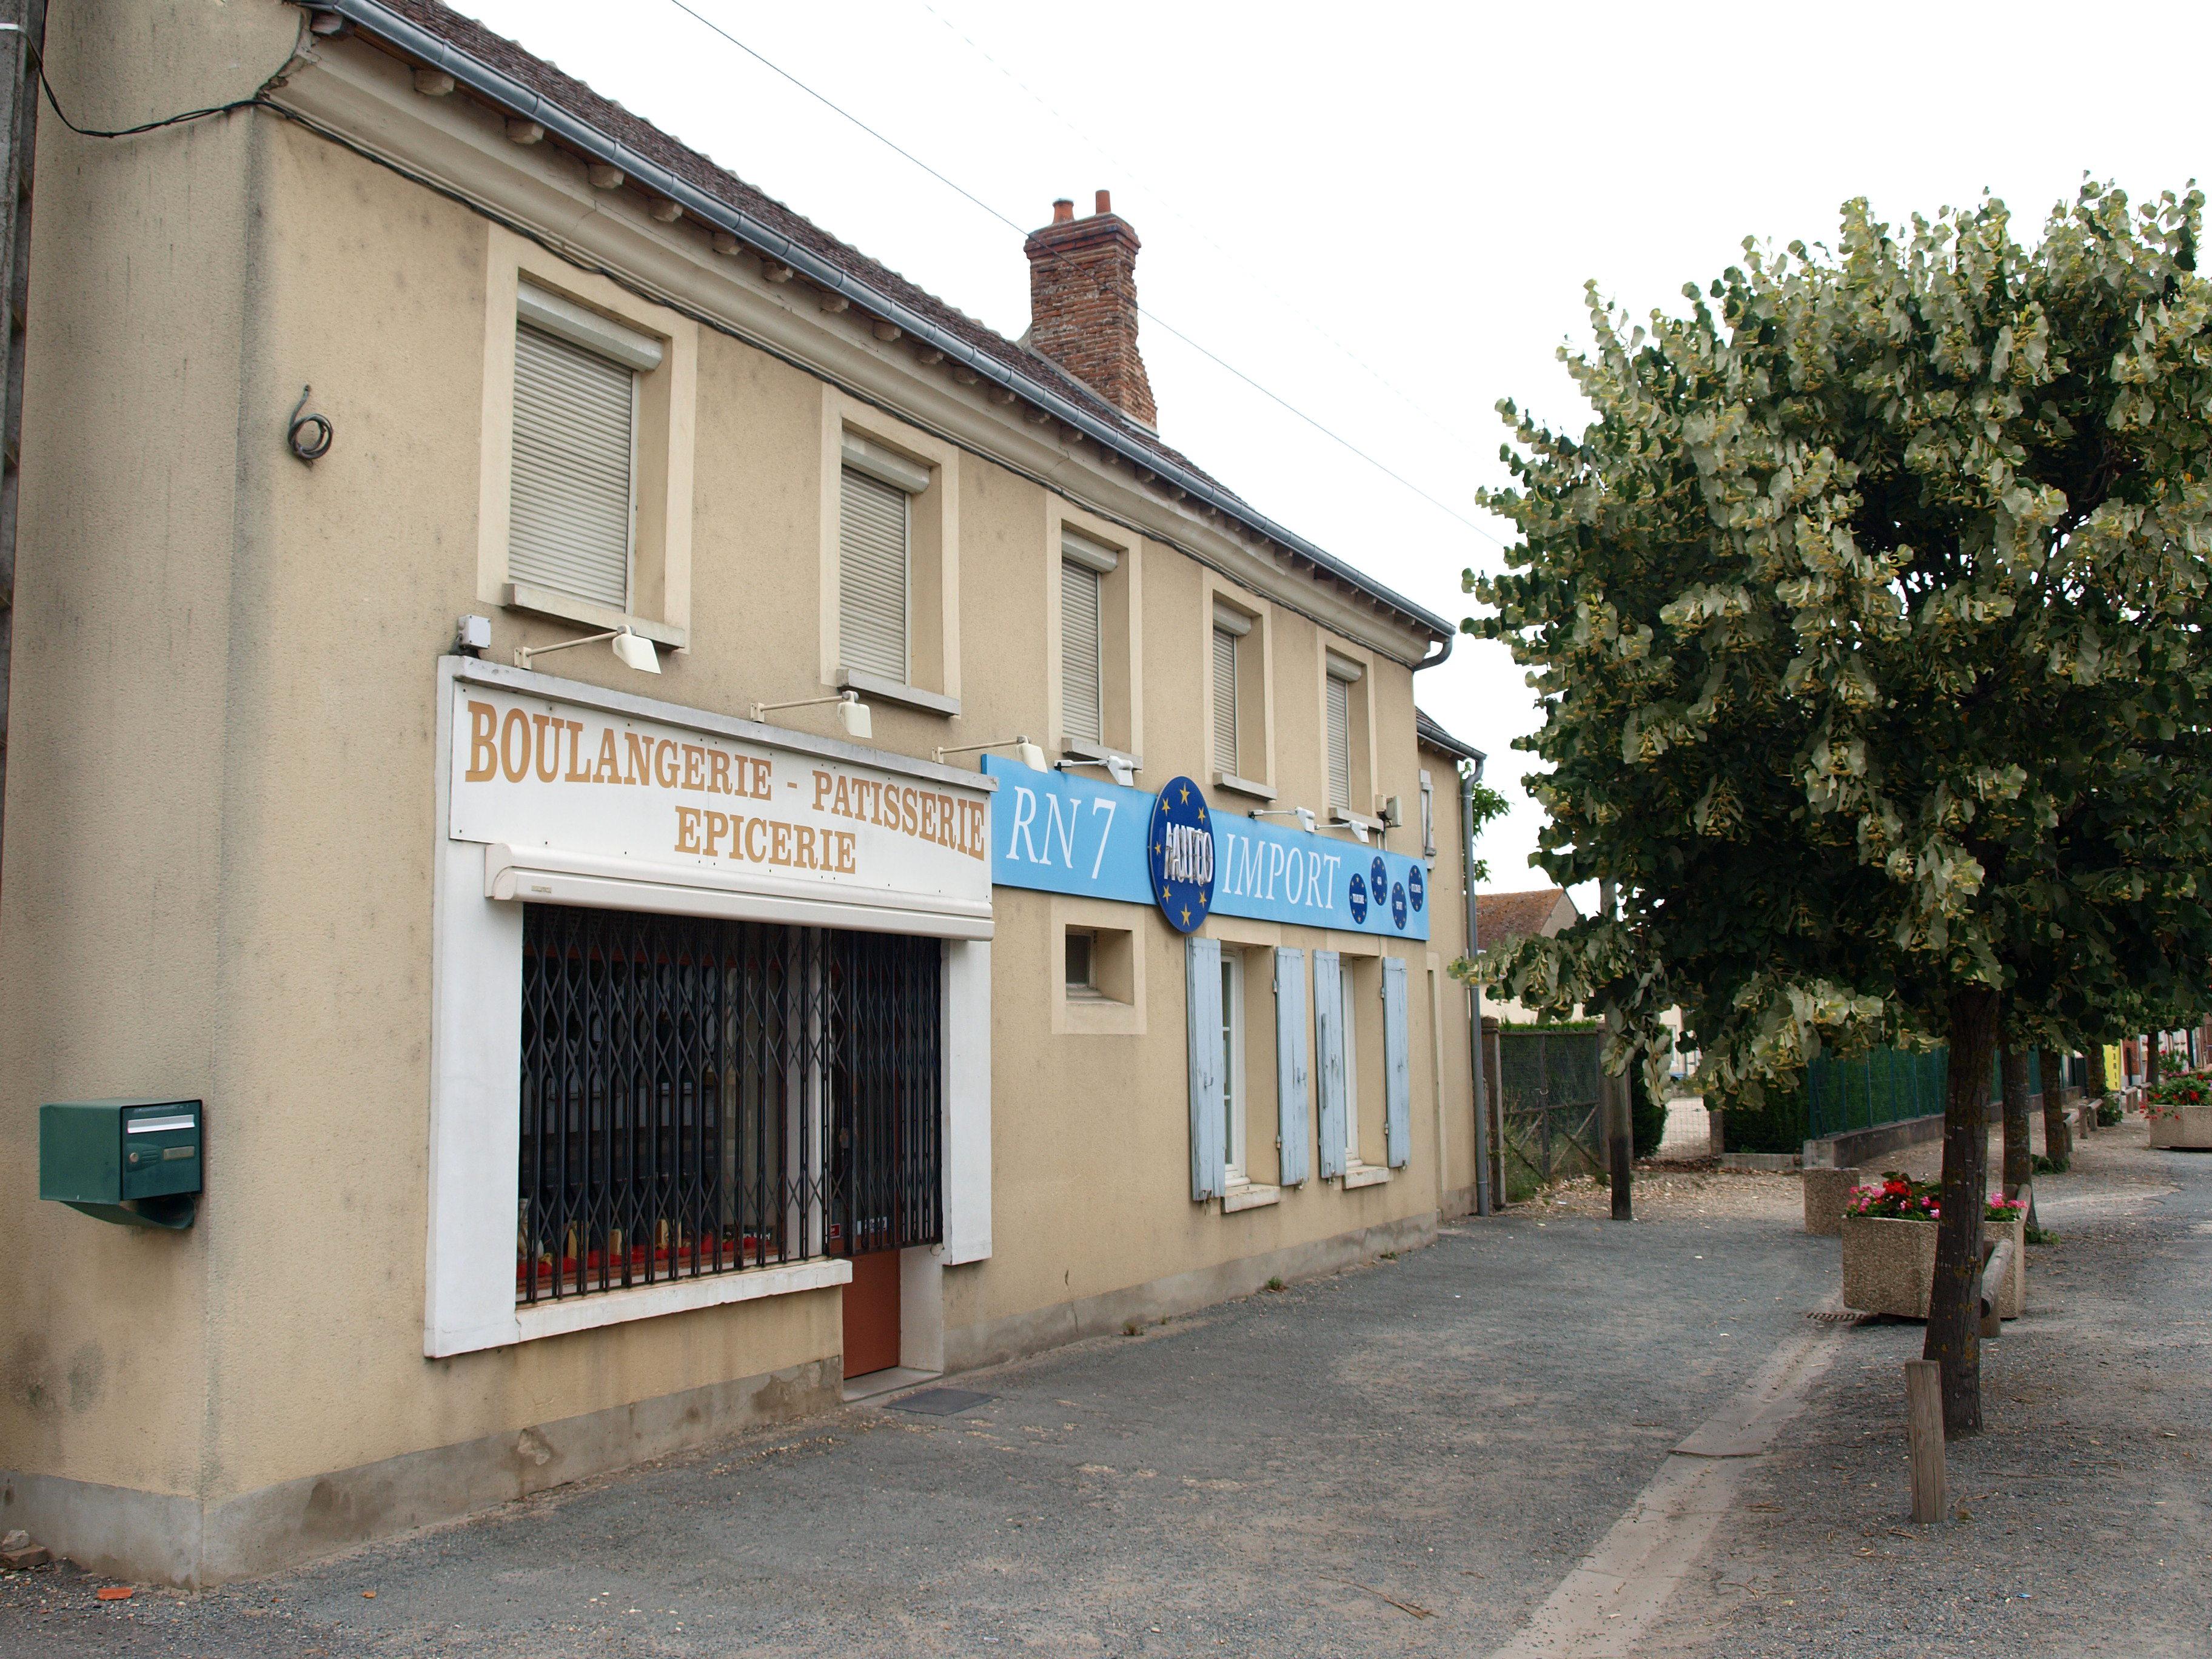 File Solterre-FR-45-La Commodité-boulangerie-01.jpg - Wikimedia Commons 1ebf3ada3d54